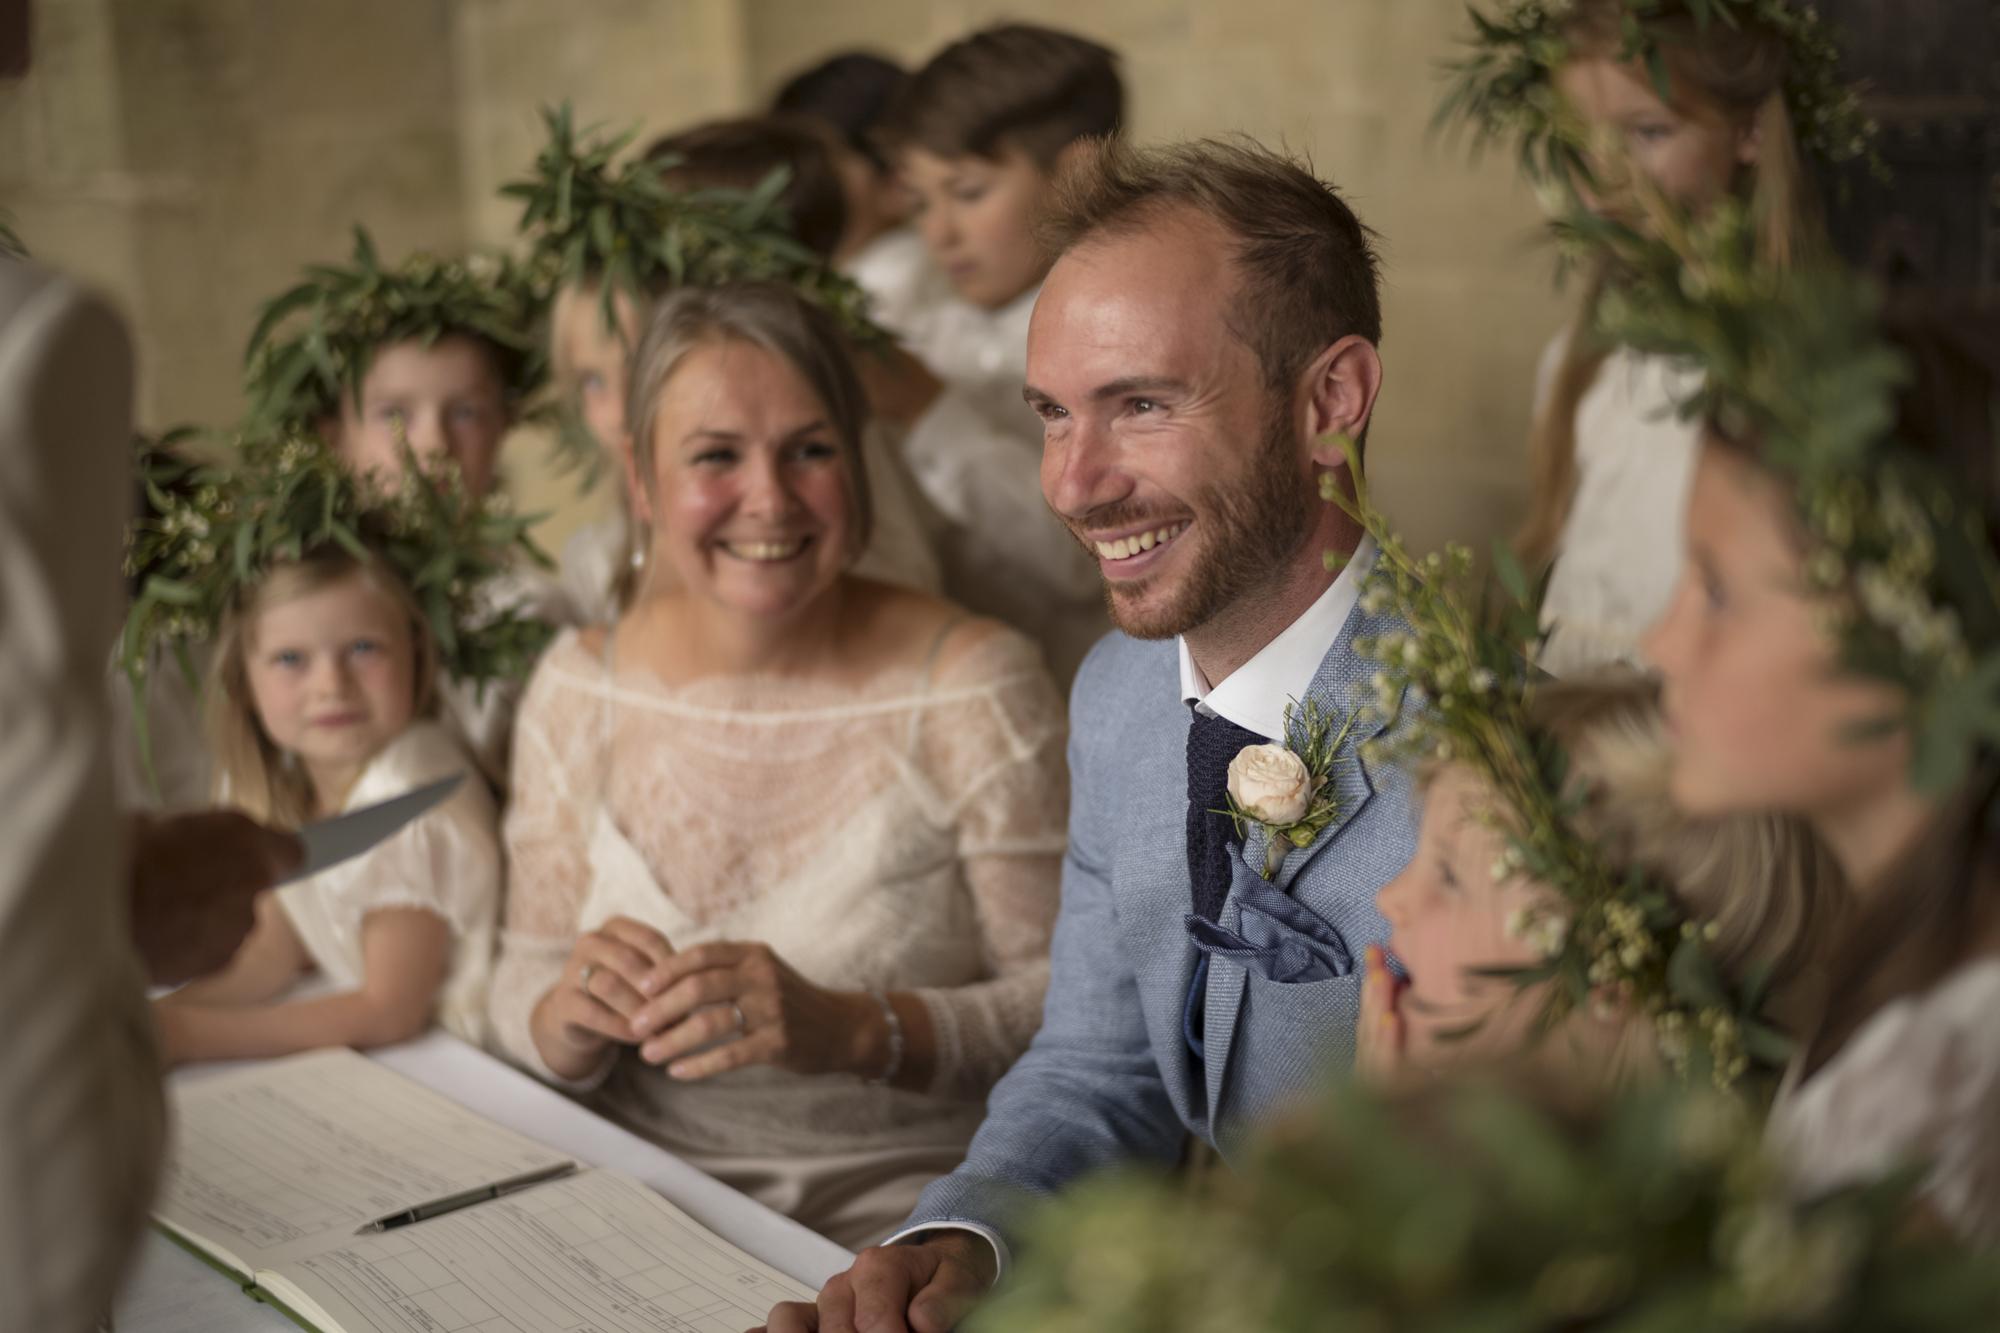 Jaz-Kate-Beaumont-Oyster-Silk-Bias-Cut-Wedding-Gown-Larkspur-Lace-Top-Sussex-Wedding-11.jpg